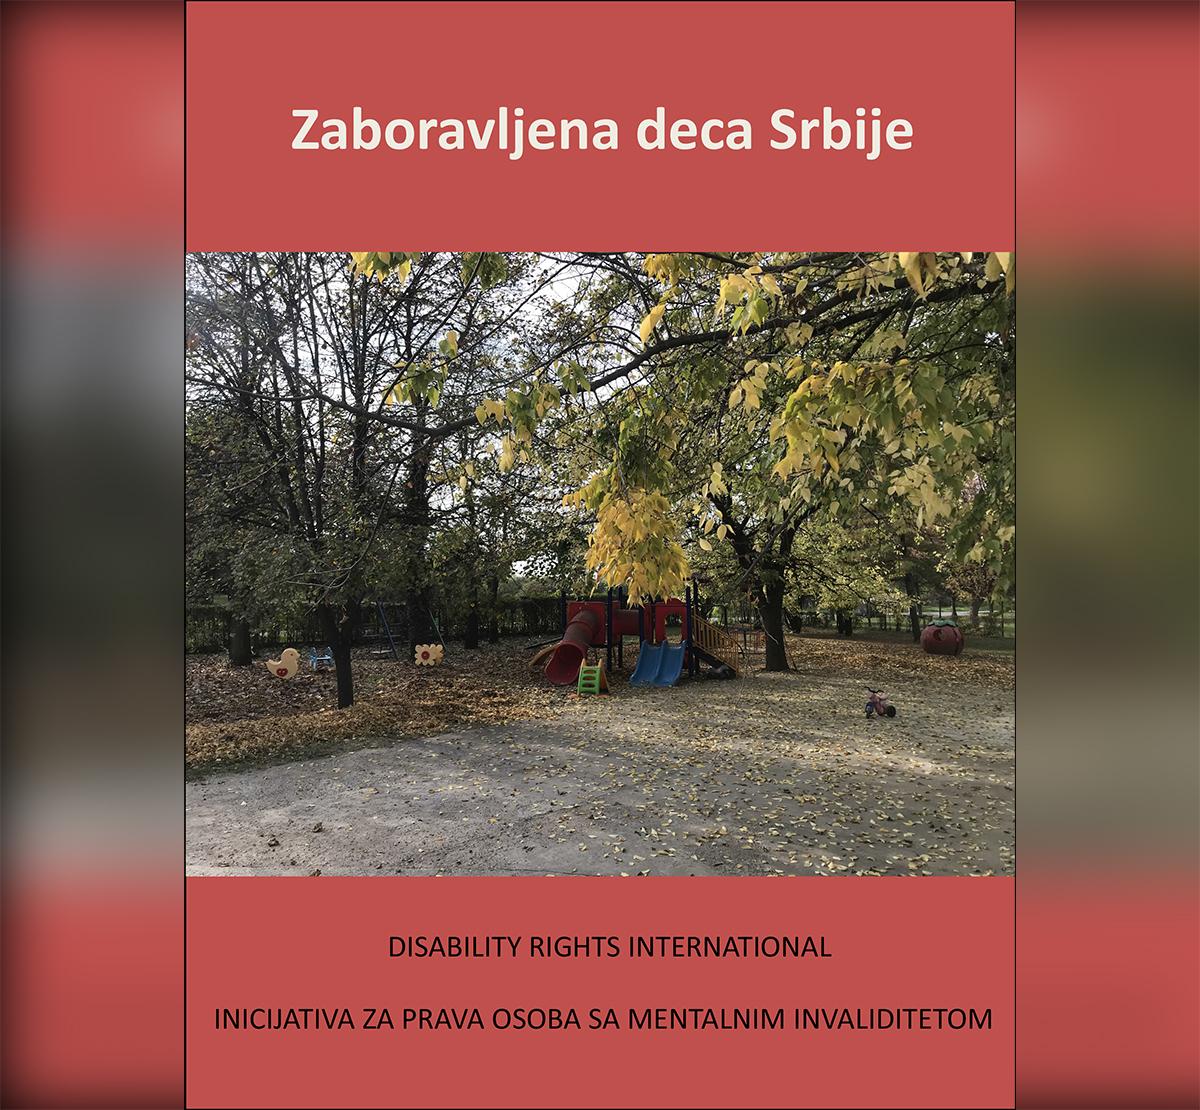 Serbia-2021-web-SRB-1-1.jpg